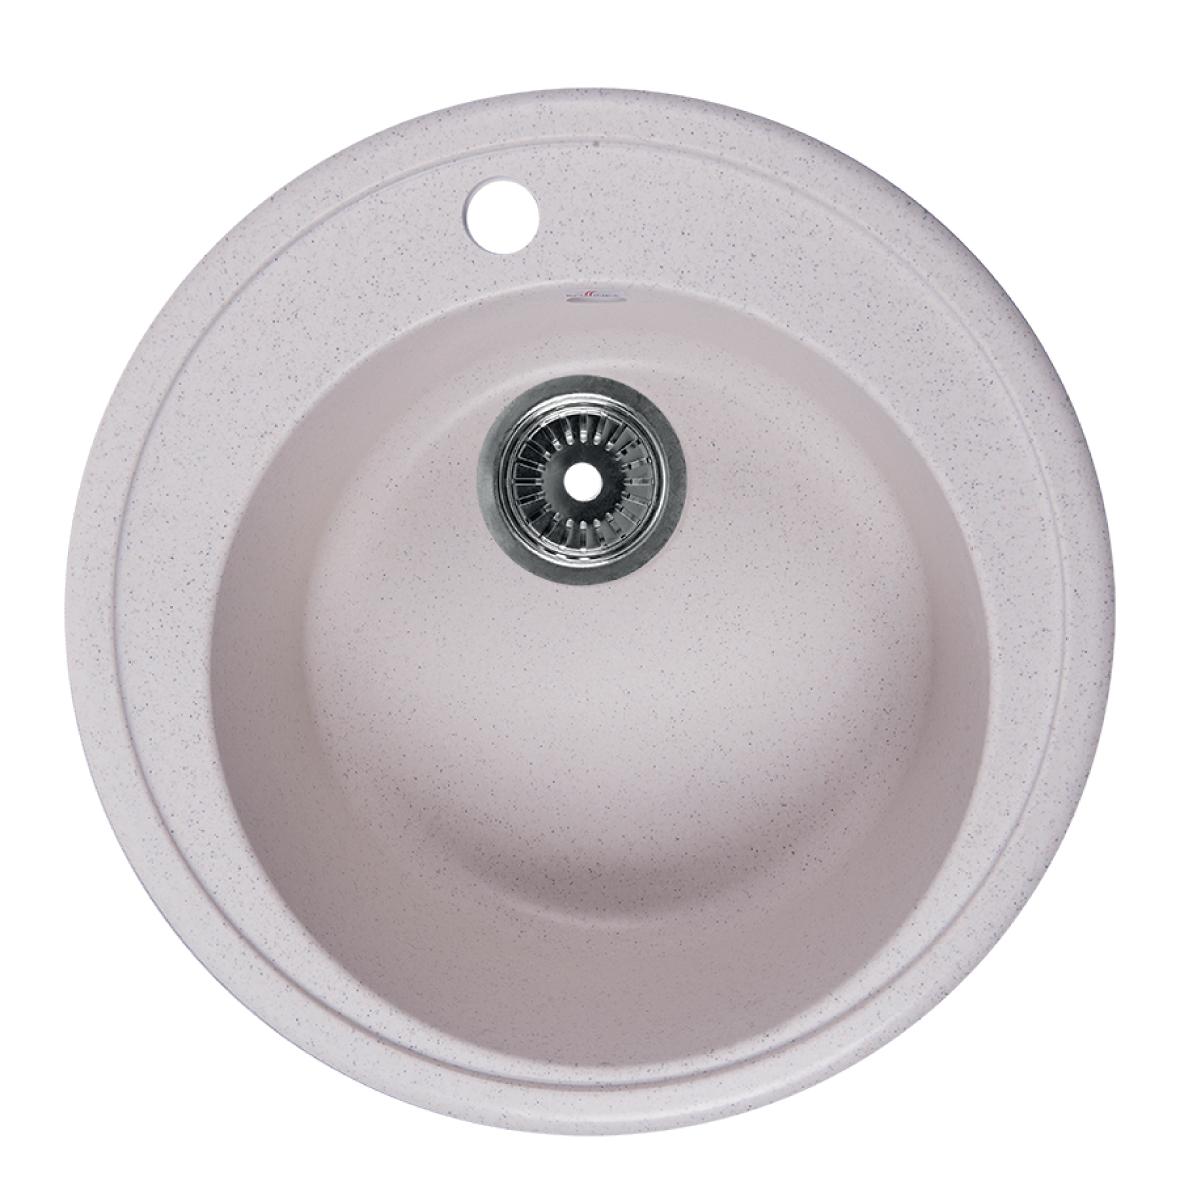 Мойка Rossinka для кухни из исскуственного камня круглая, с сифоном, RS51R-White